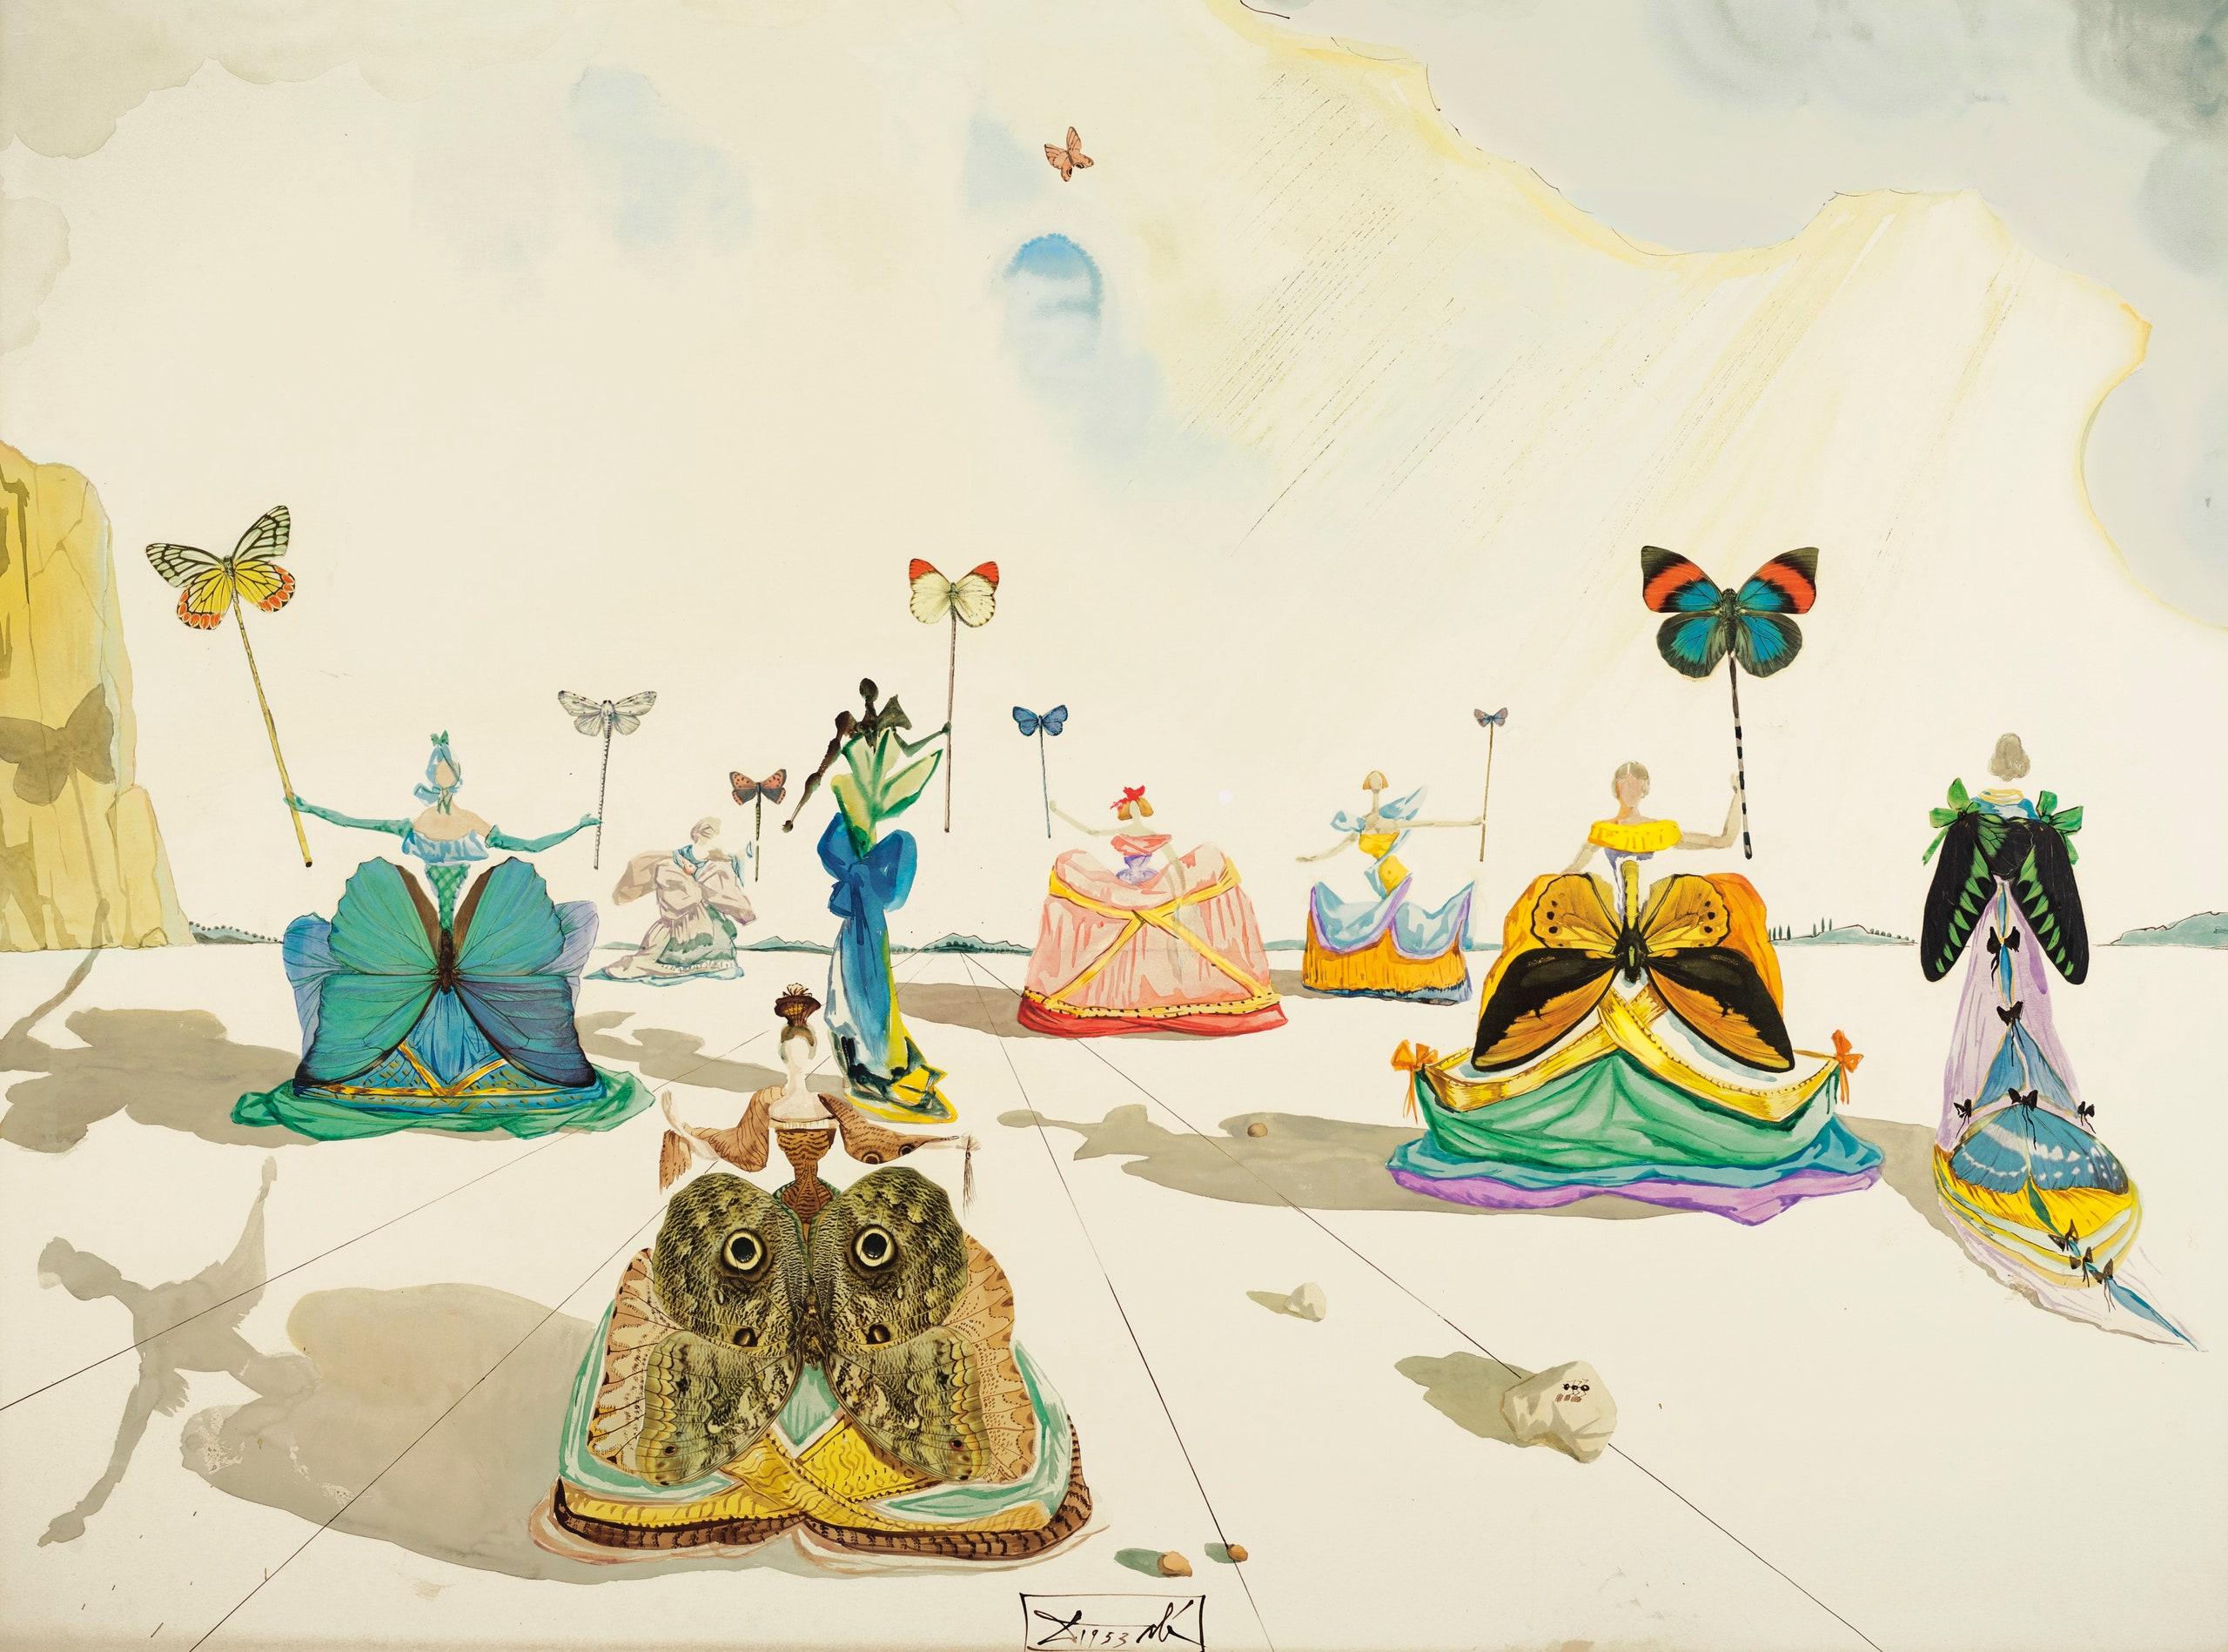 Tác phẩm Femmes aux Papillons của họa sỹ Salvador Dalí. Ảnh: Courtesy of Christie's Images Ltd. 2019